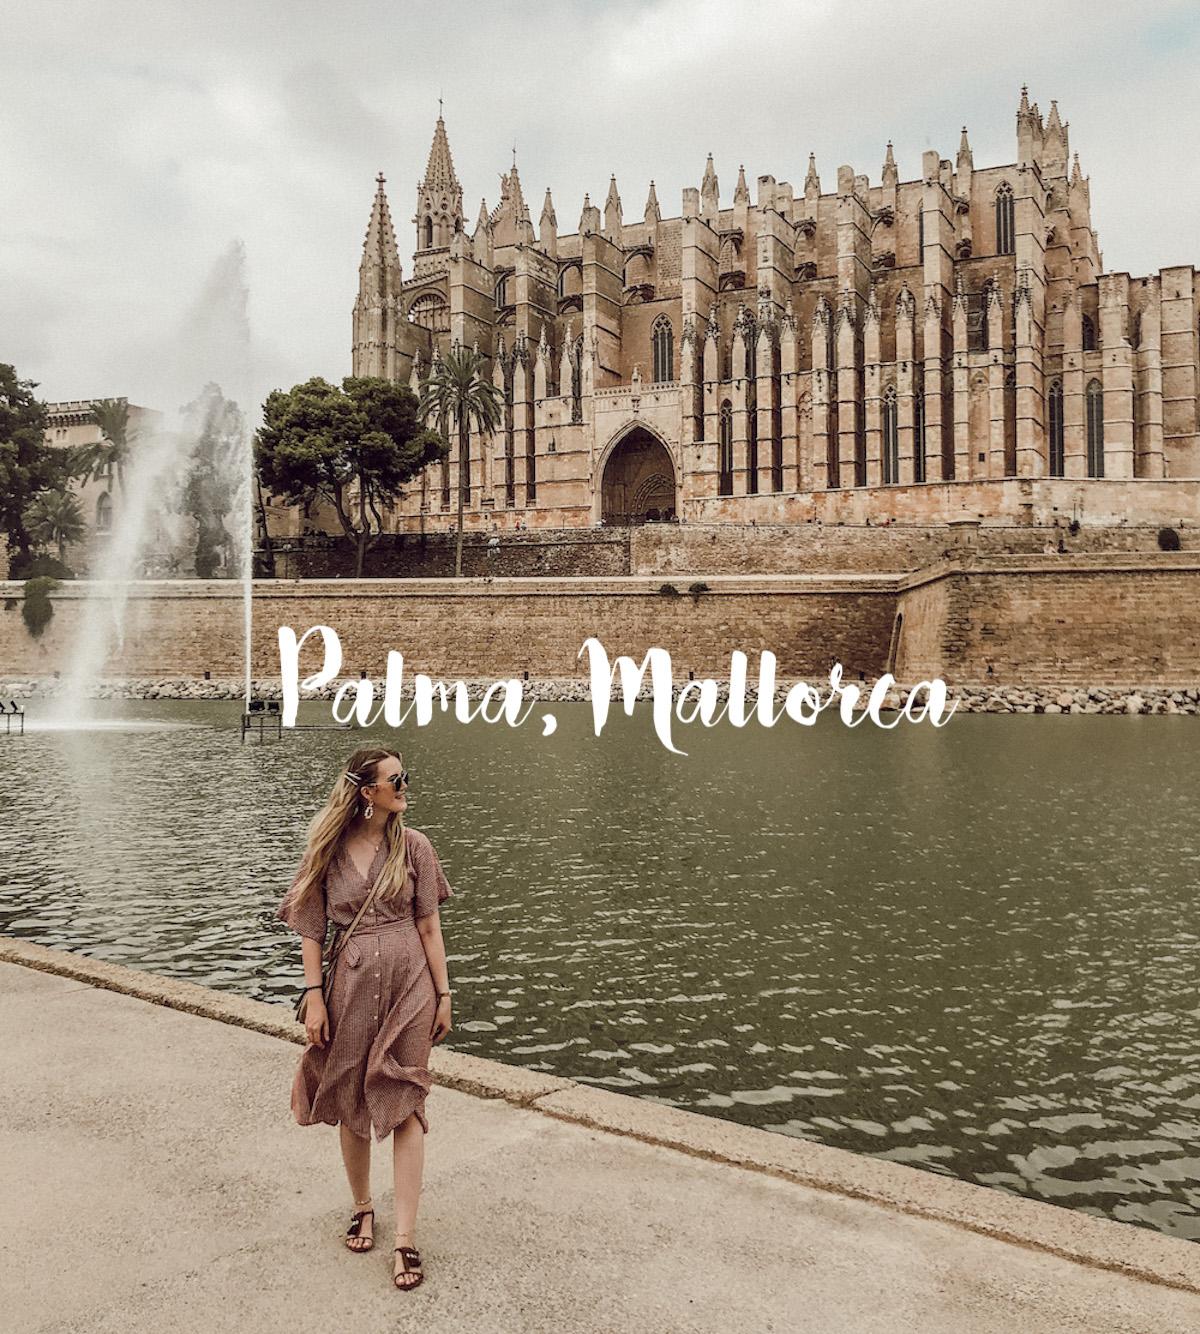 Sehenswerte Orte Mallorca Dörfer Städte Traveldiary Reisetipps Empfehlung Travelblog Palma Palau de l'Almudaina Kathedrale La Seu